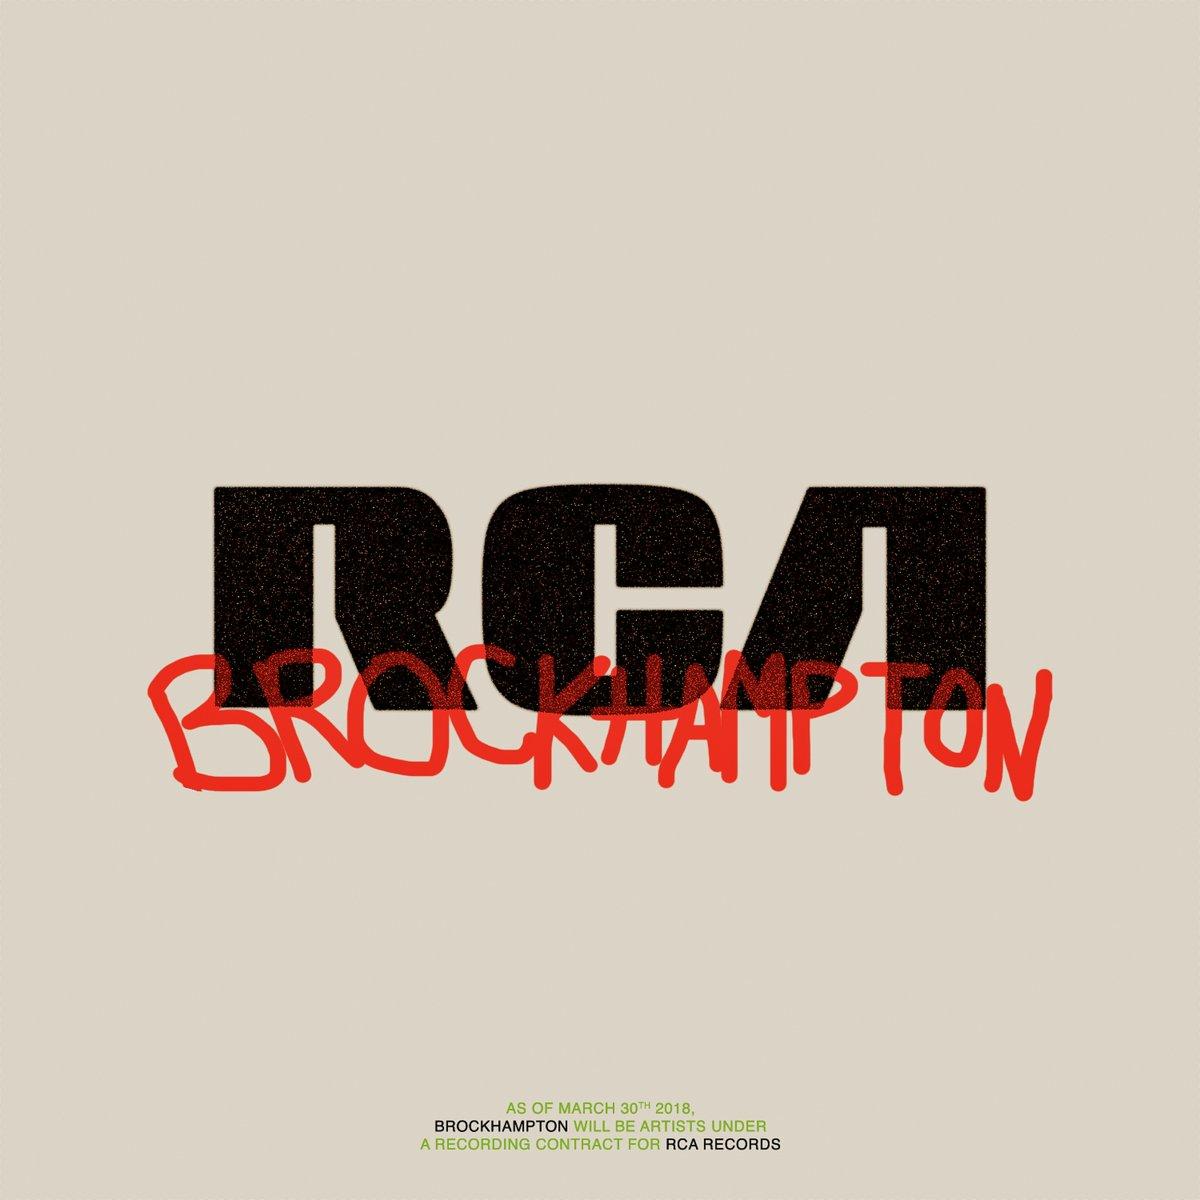 brockhampton rca records